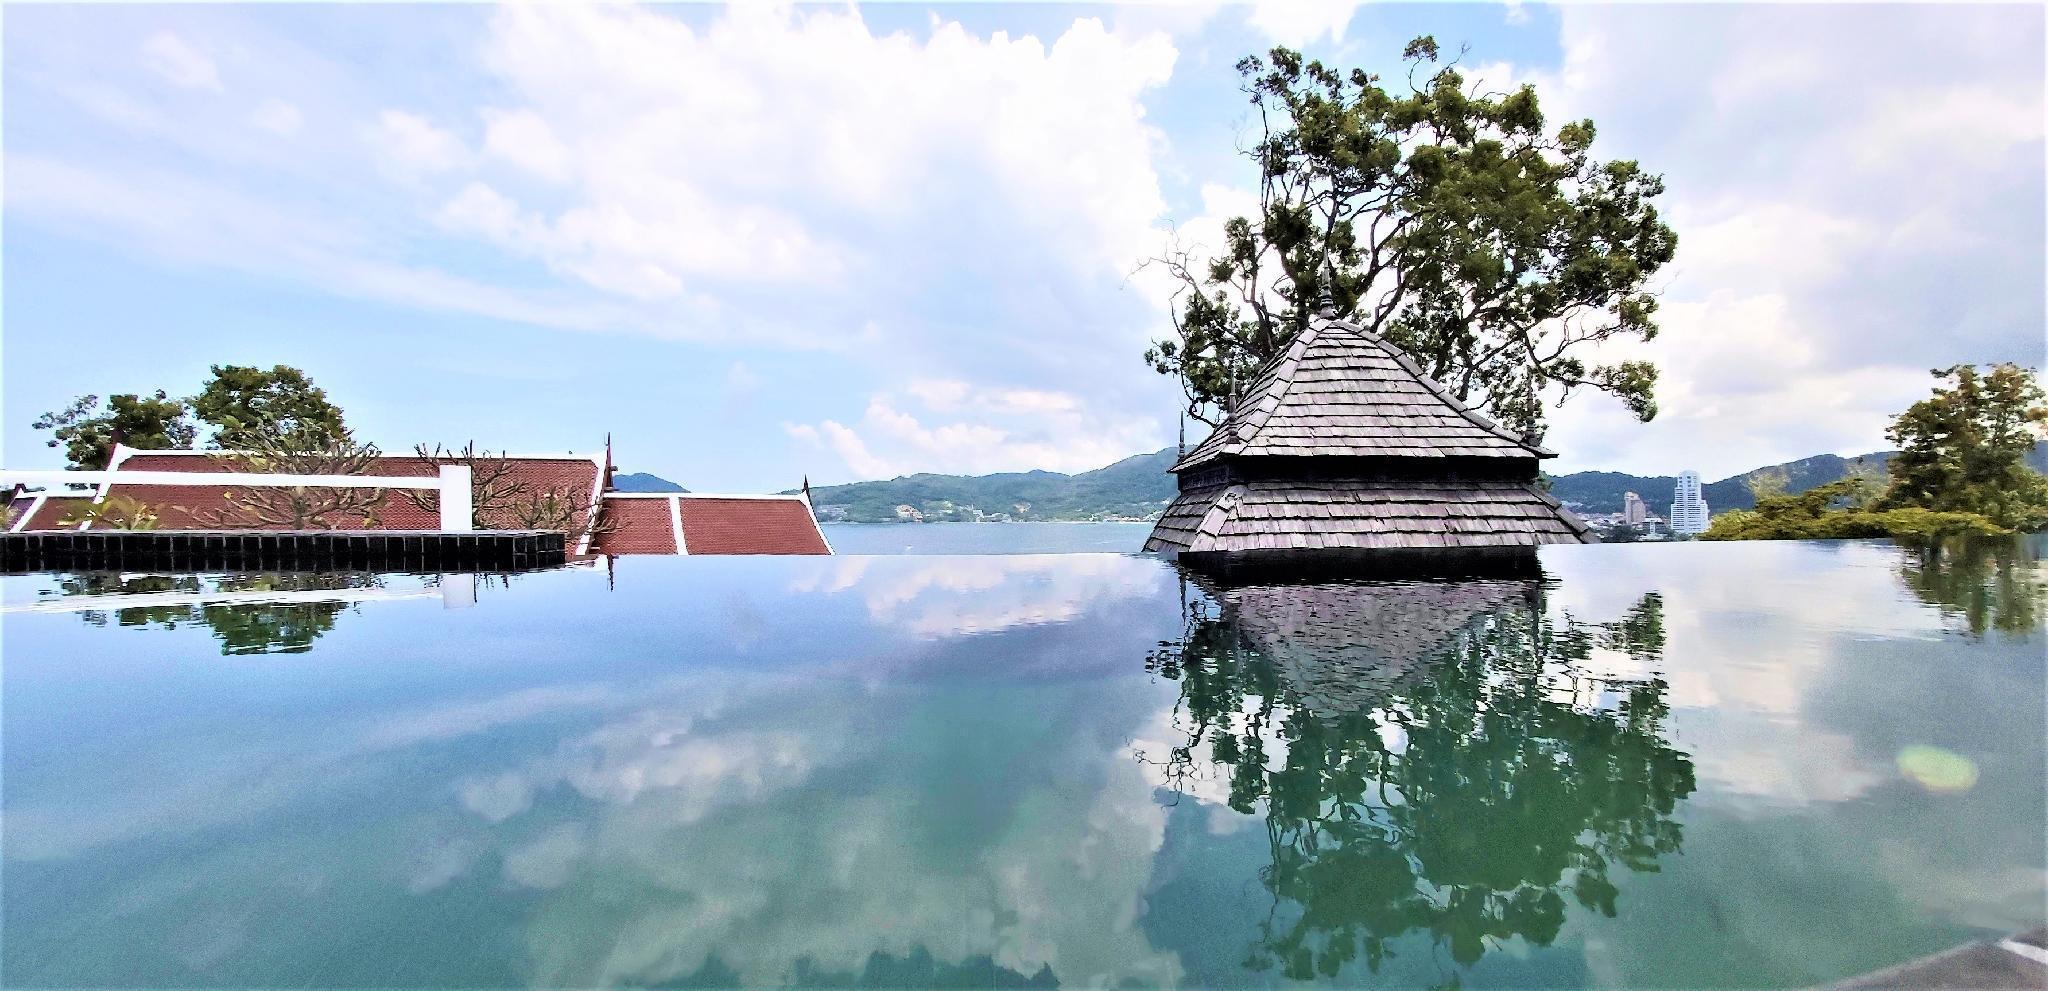 Sea Cave Villa Patong 5 ห้องนอน 4 ห้องน้ำส่วนตัว ขนาด 300 ตร.ม. – ป่าตอง